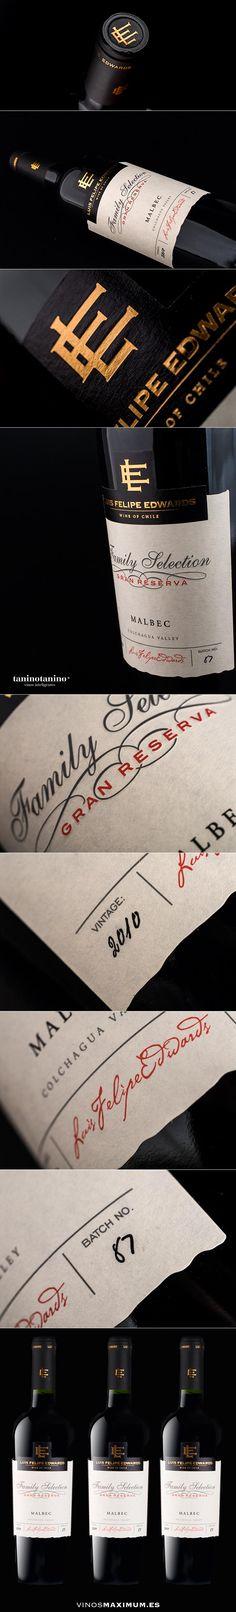 Luis Felipe Edwards Gran Reserva Selección Familiar Malbec 2010 #vinosmaximum Beverage Packaging, Label Design, Packaging Design, Wine And Spirits, Wine Drinks, Beverages, Wine Label, Wine, Bottles